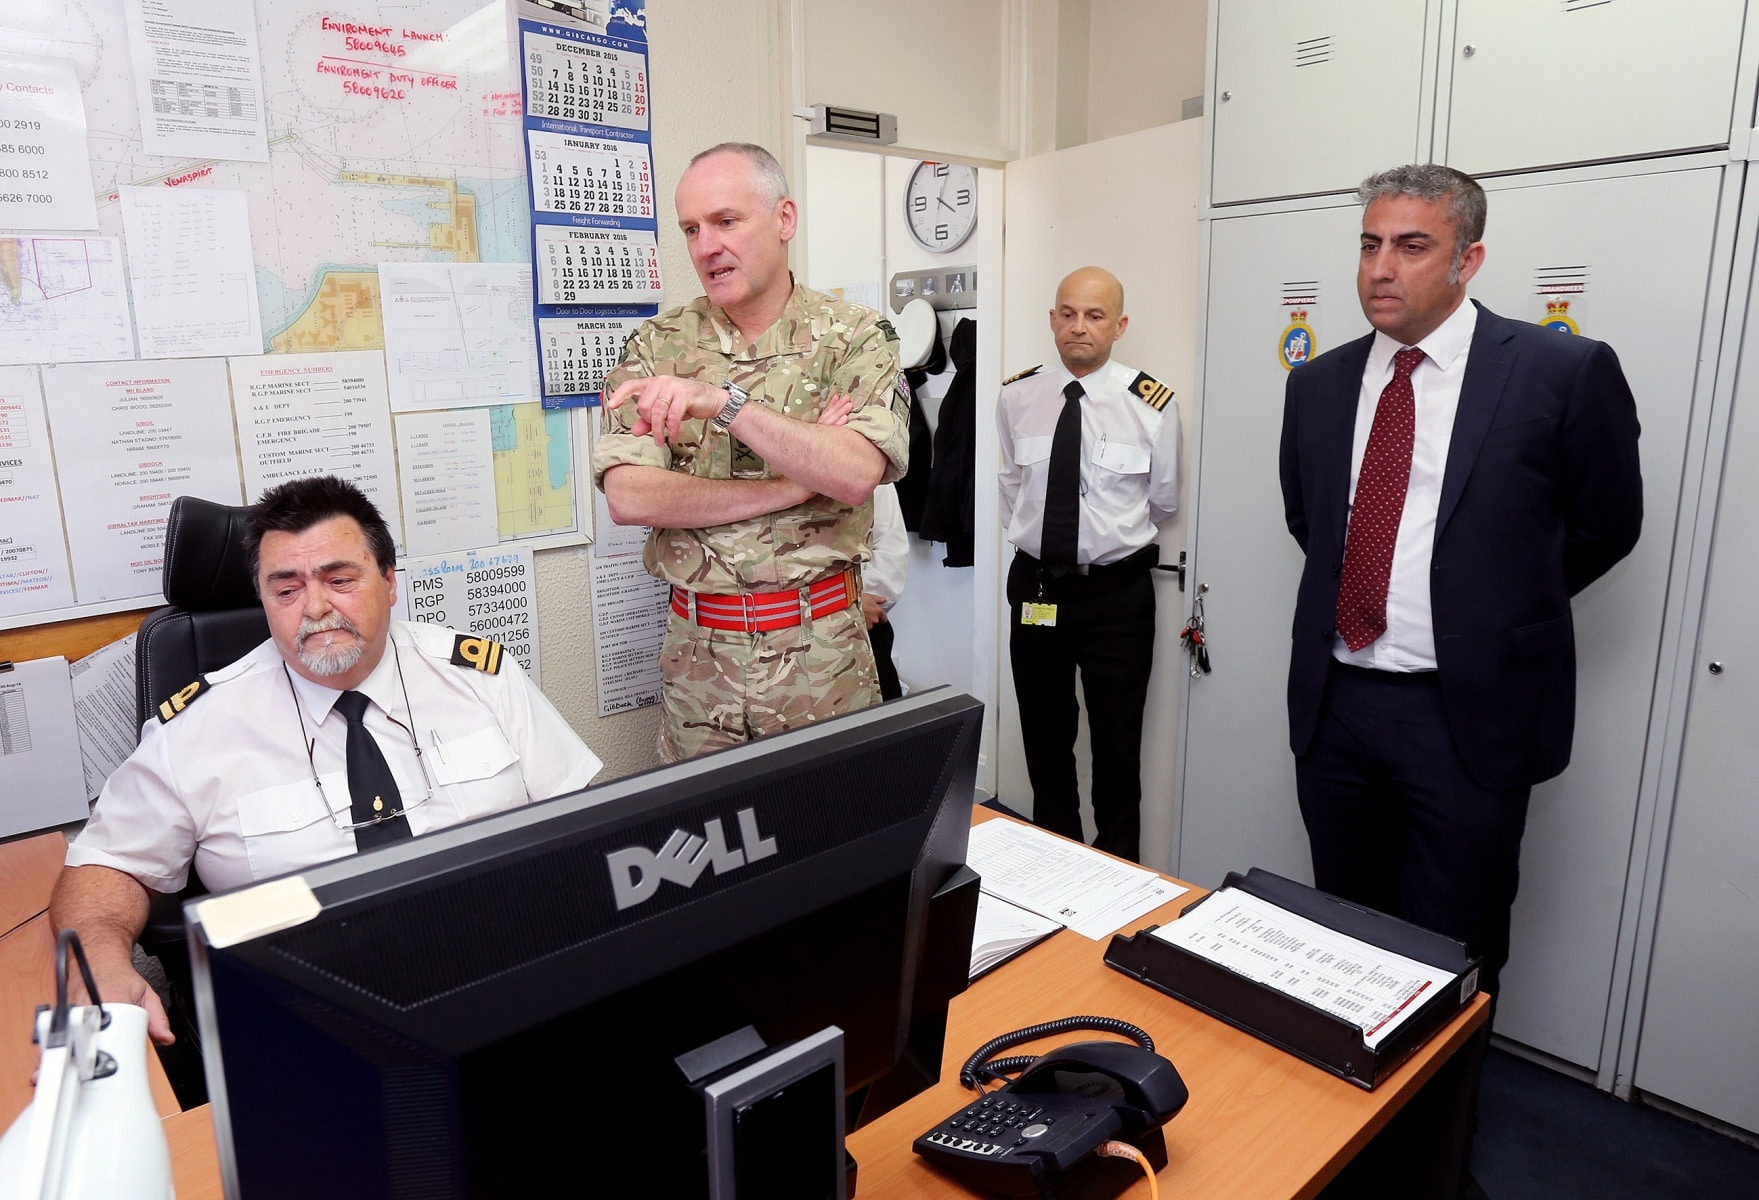 visita-oficial-del-gobernador-al-puerto-de-gibraltar_25881621560_o